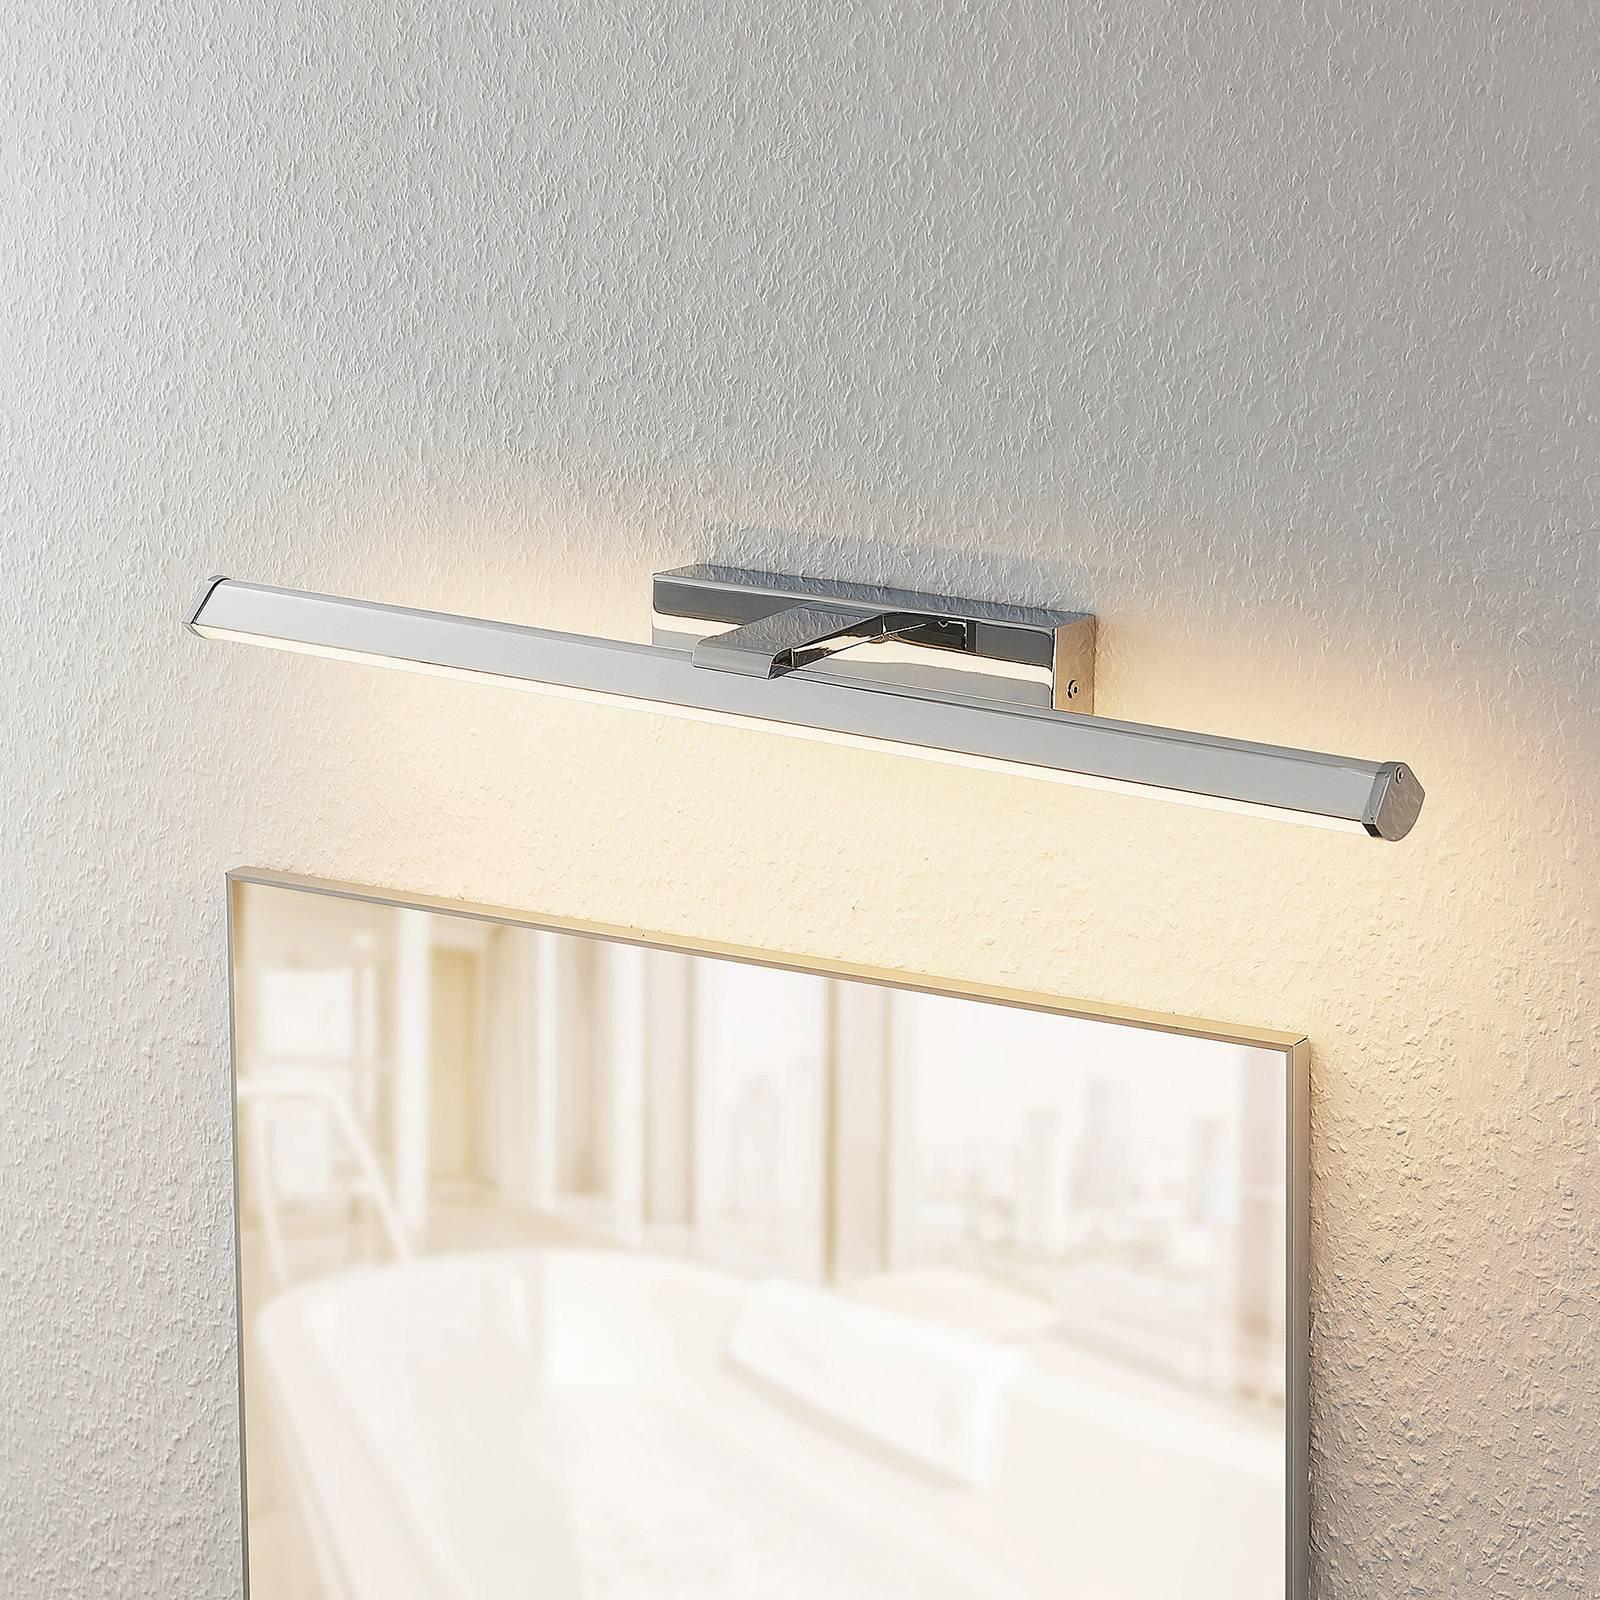 Lindby Bilak LED-speillampe